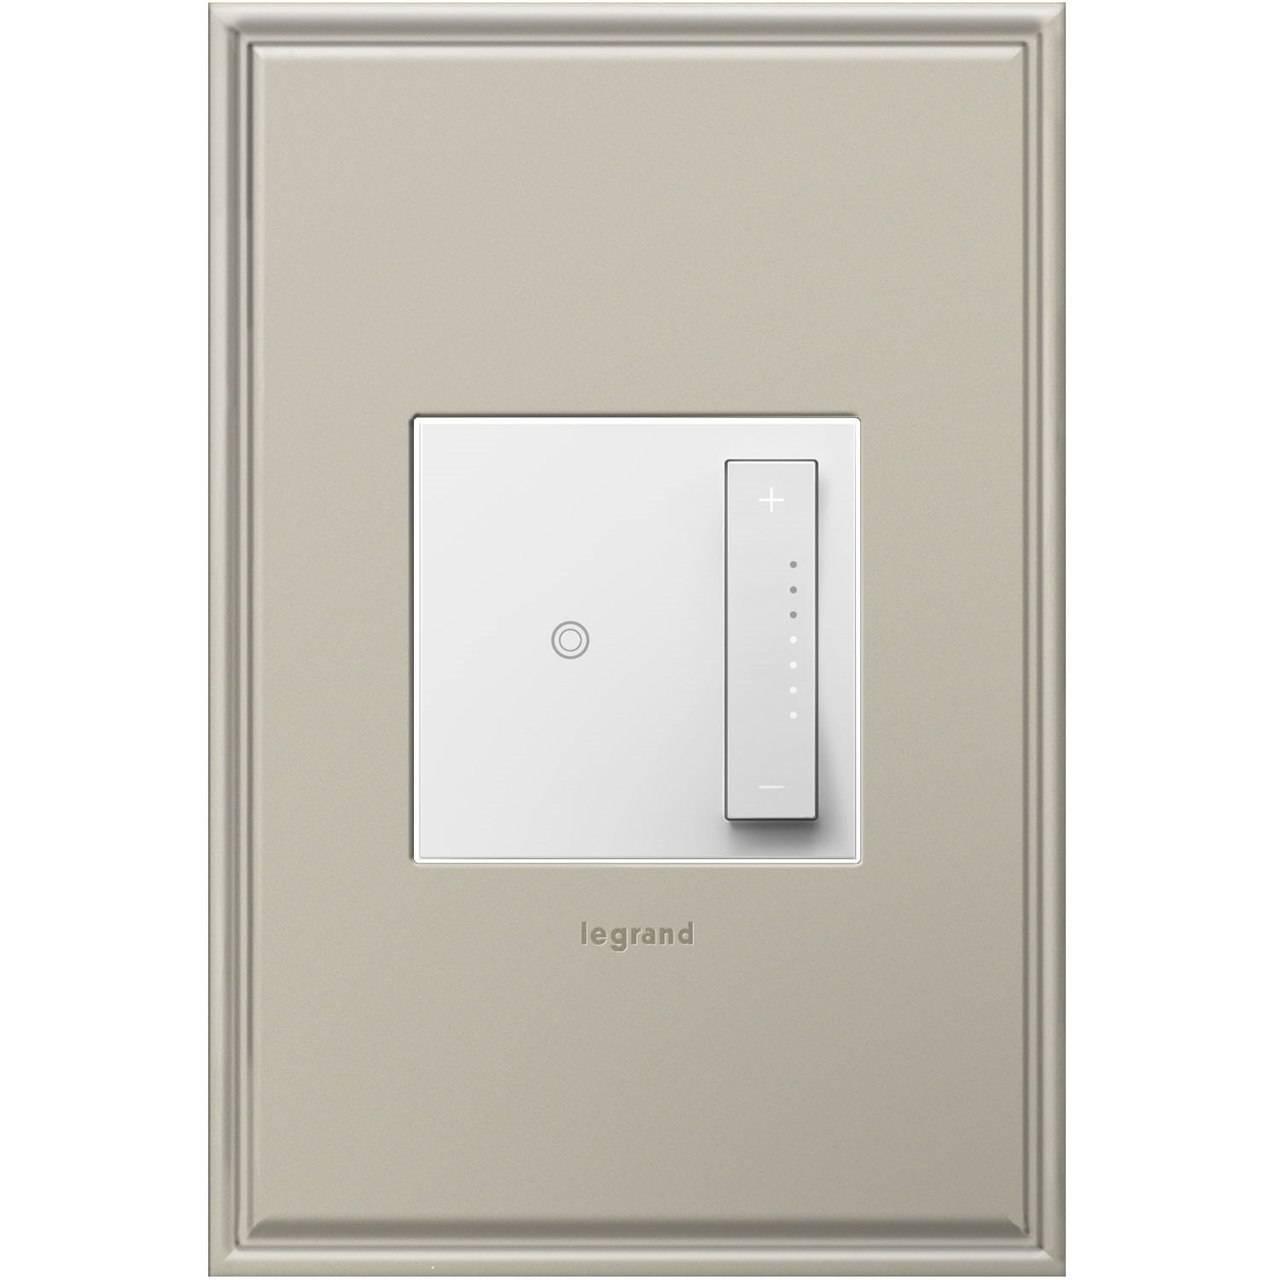 Legrand adorne softap dimmer switch at Brand lighting